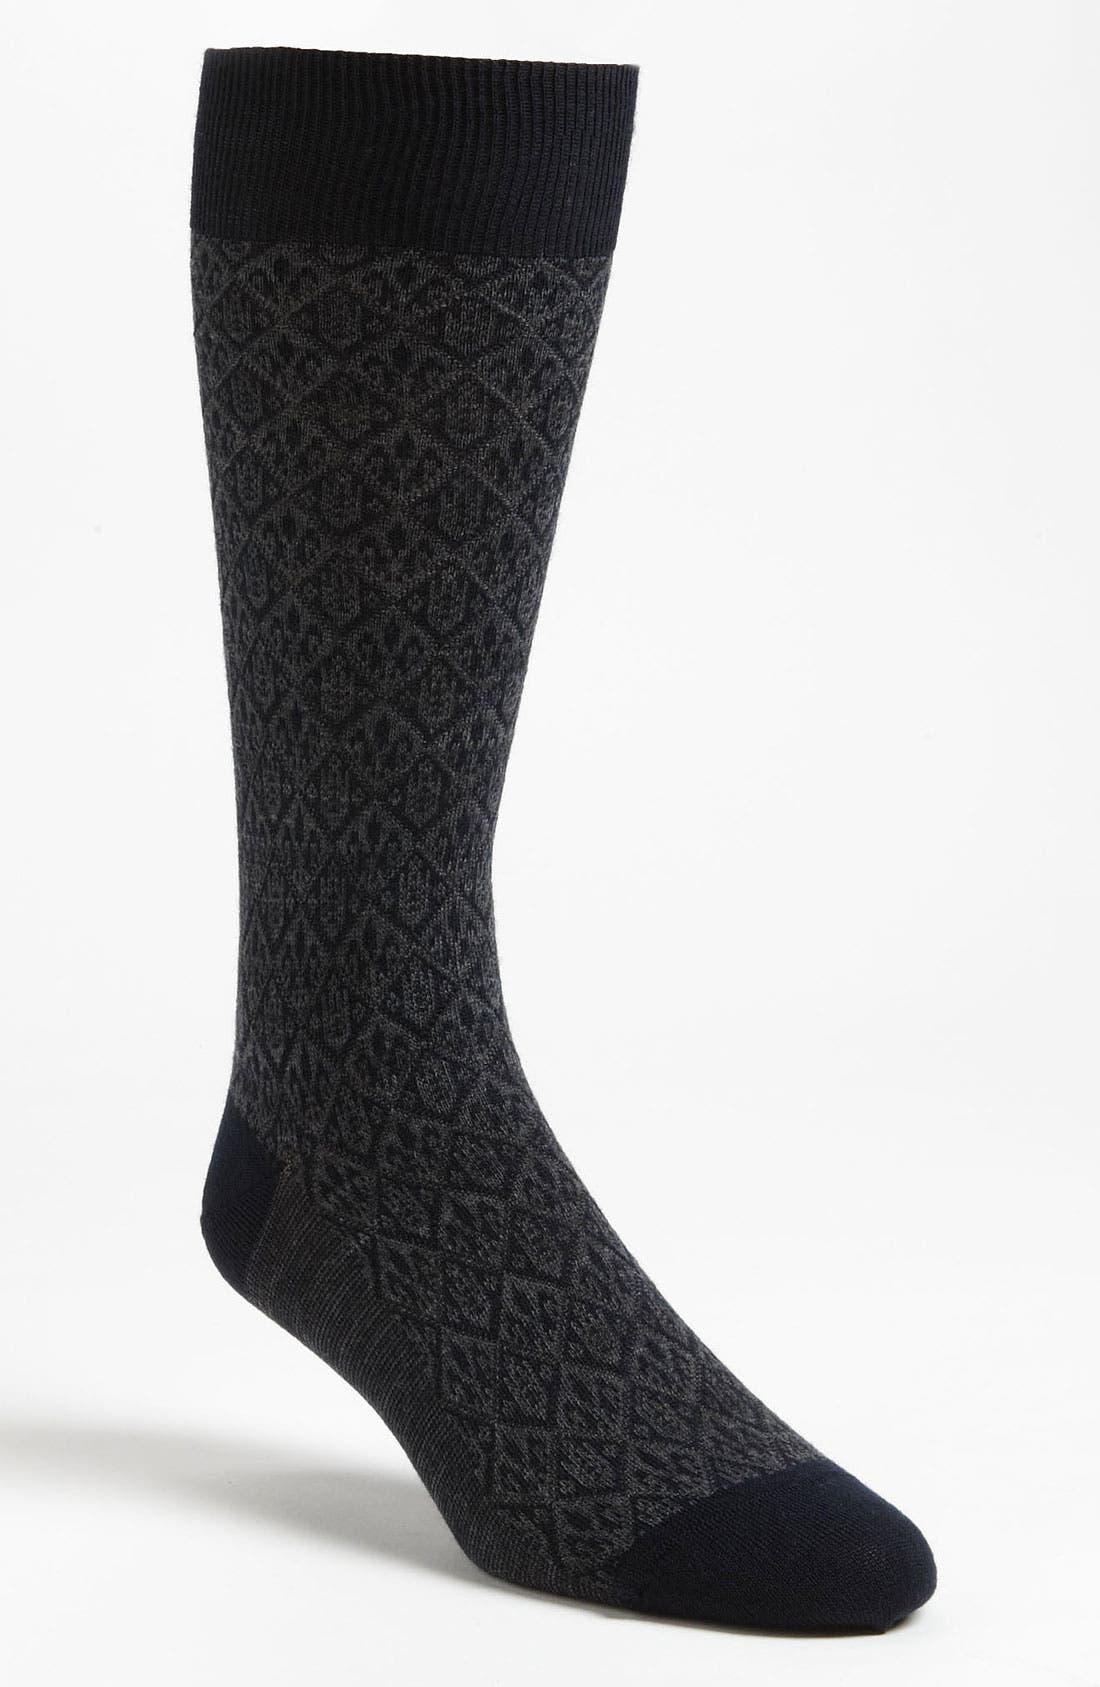 Main Image - Pantherella 'Vintage Collection' Fleur de Lis Socks